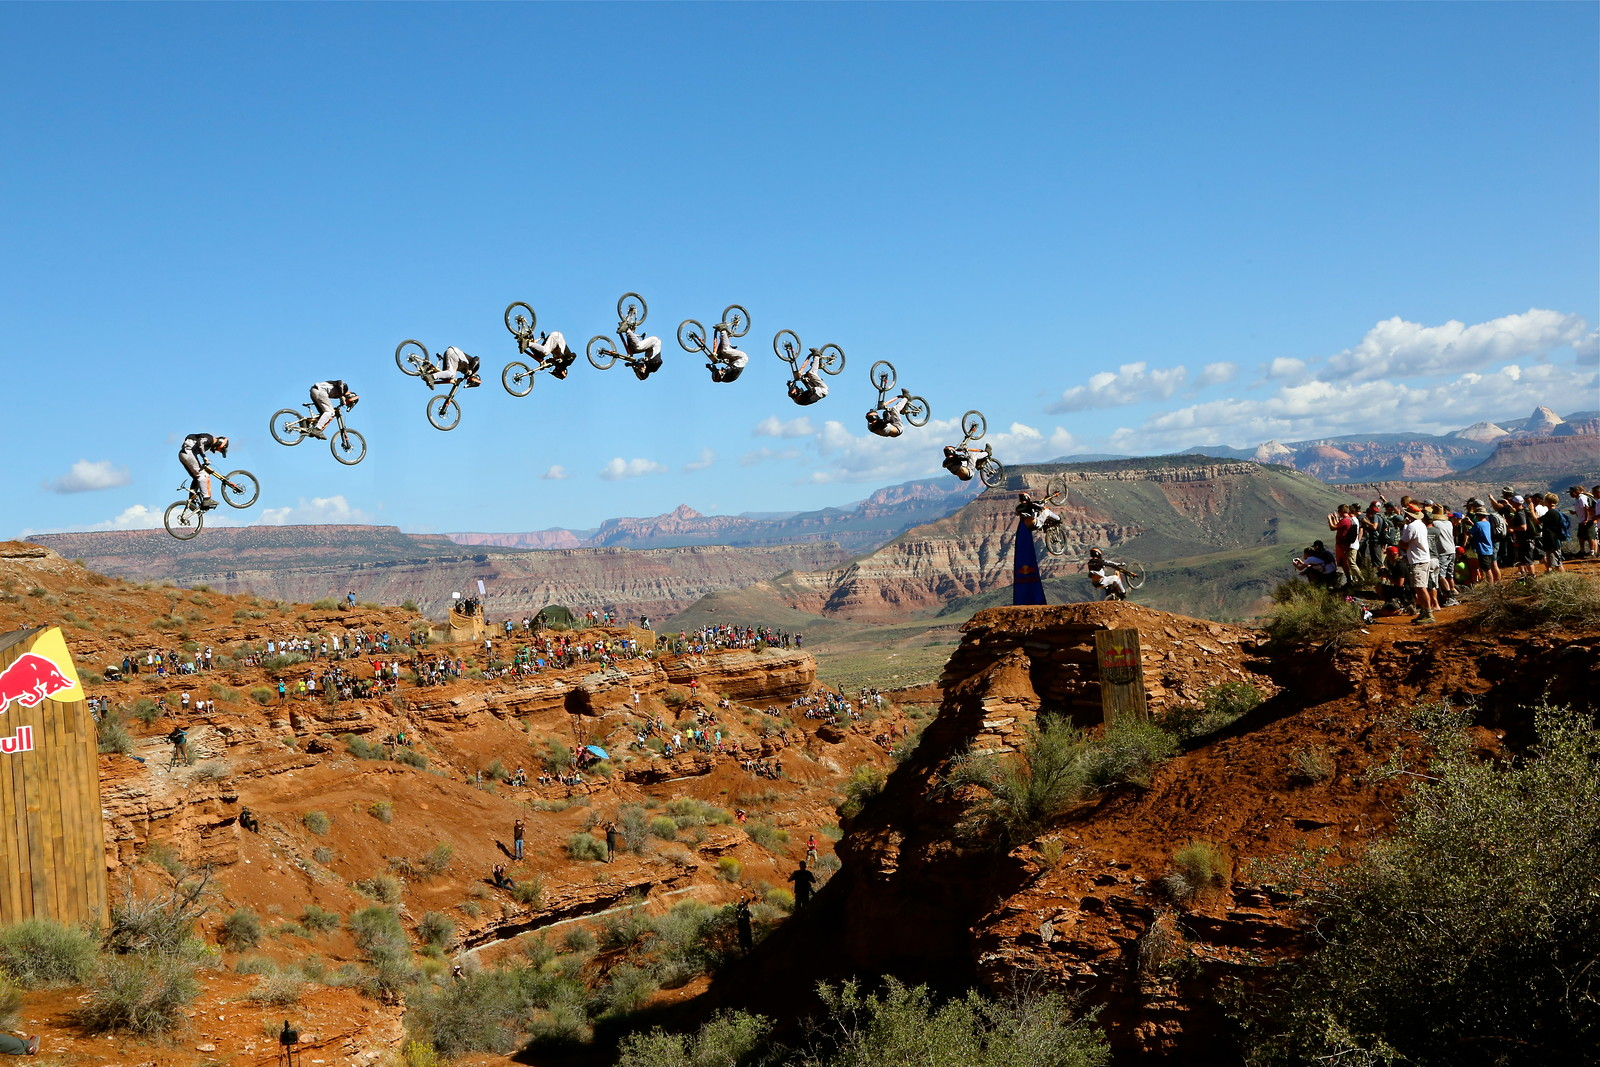 Tom van Steenbergen Rampage canyon gap front flip  - Malcolm Mclaws - Mountain Biking Pictures - Vital MTB